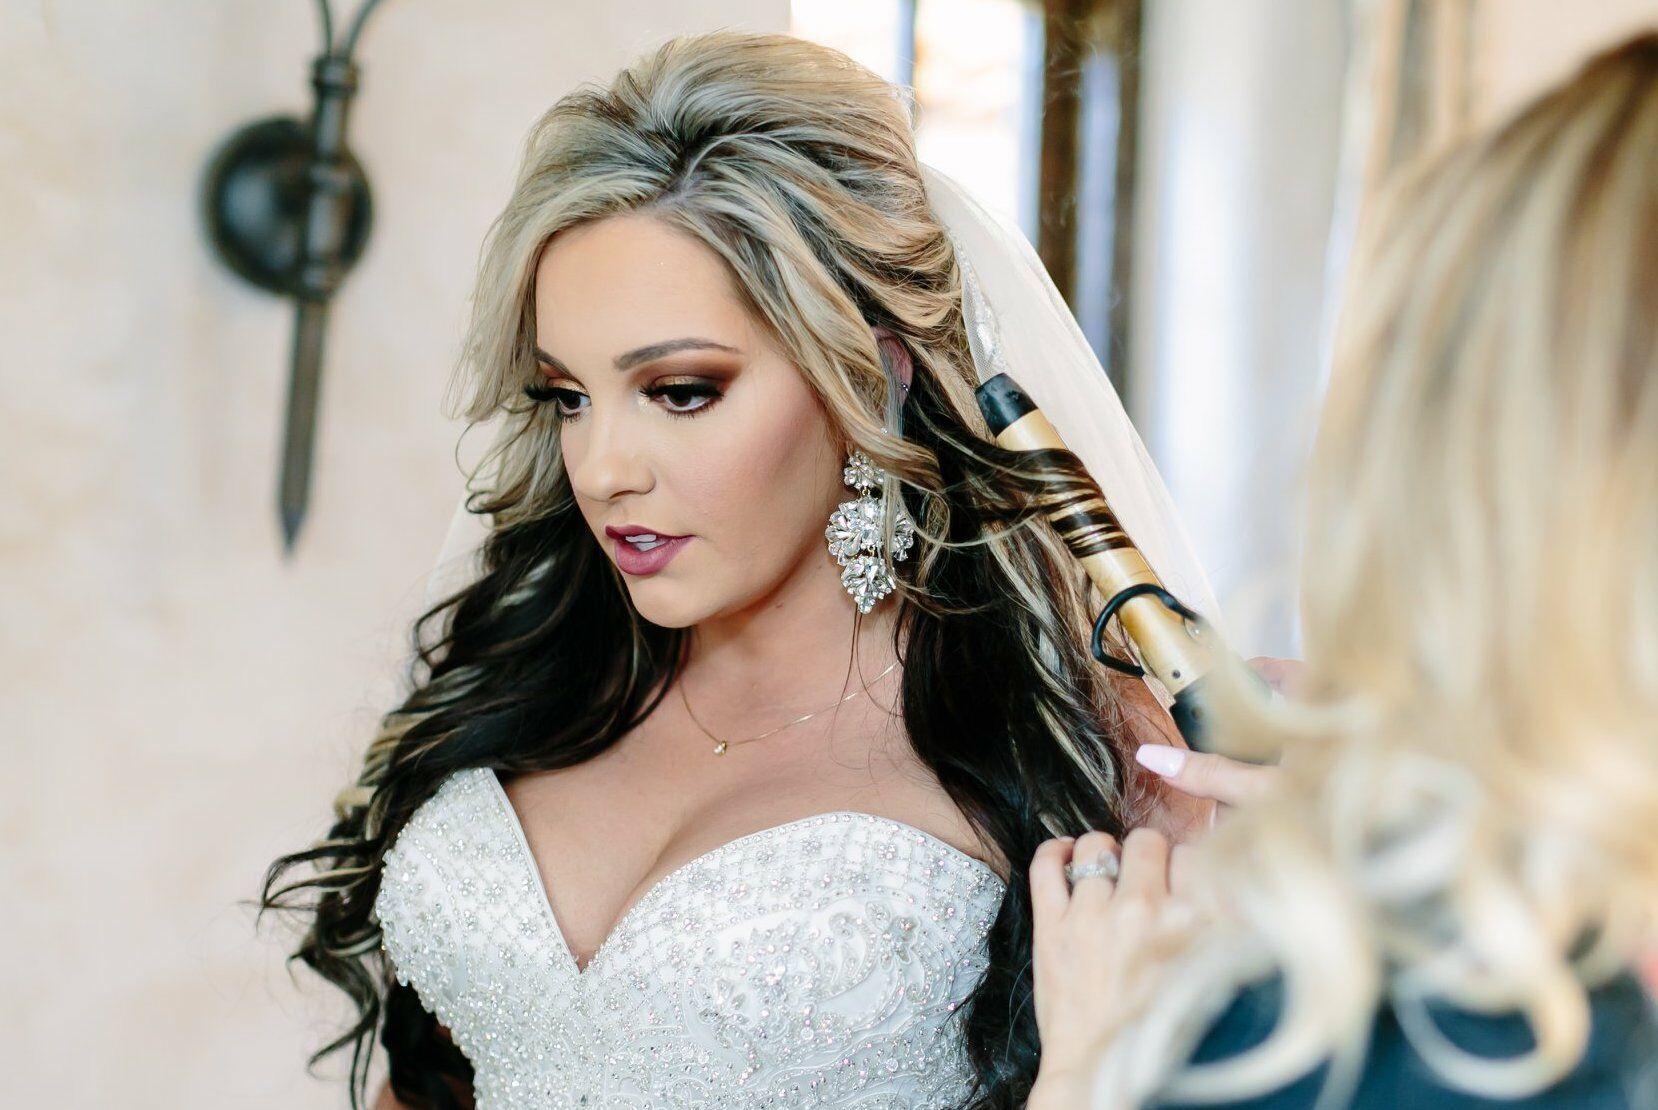 Southern Tease Hair Makeup & Boutique | Beauty - New Braunfels, TX